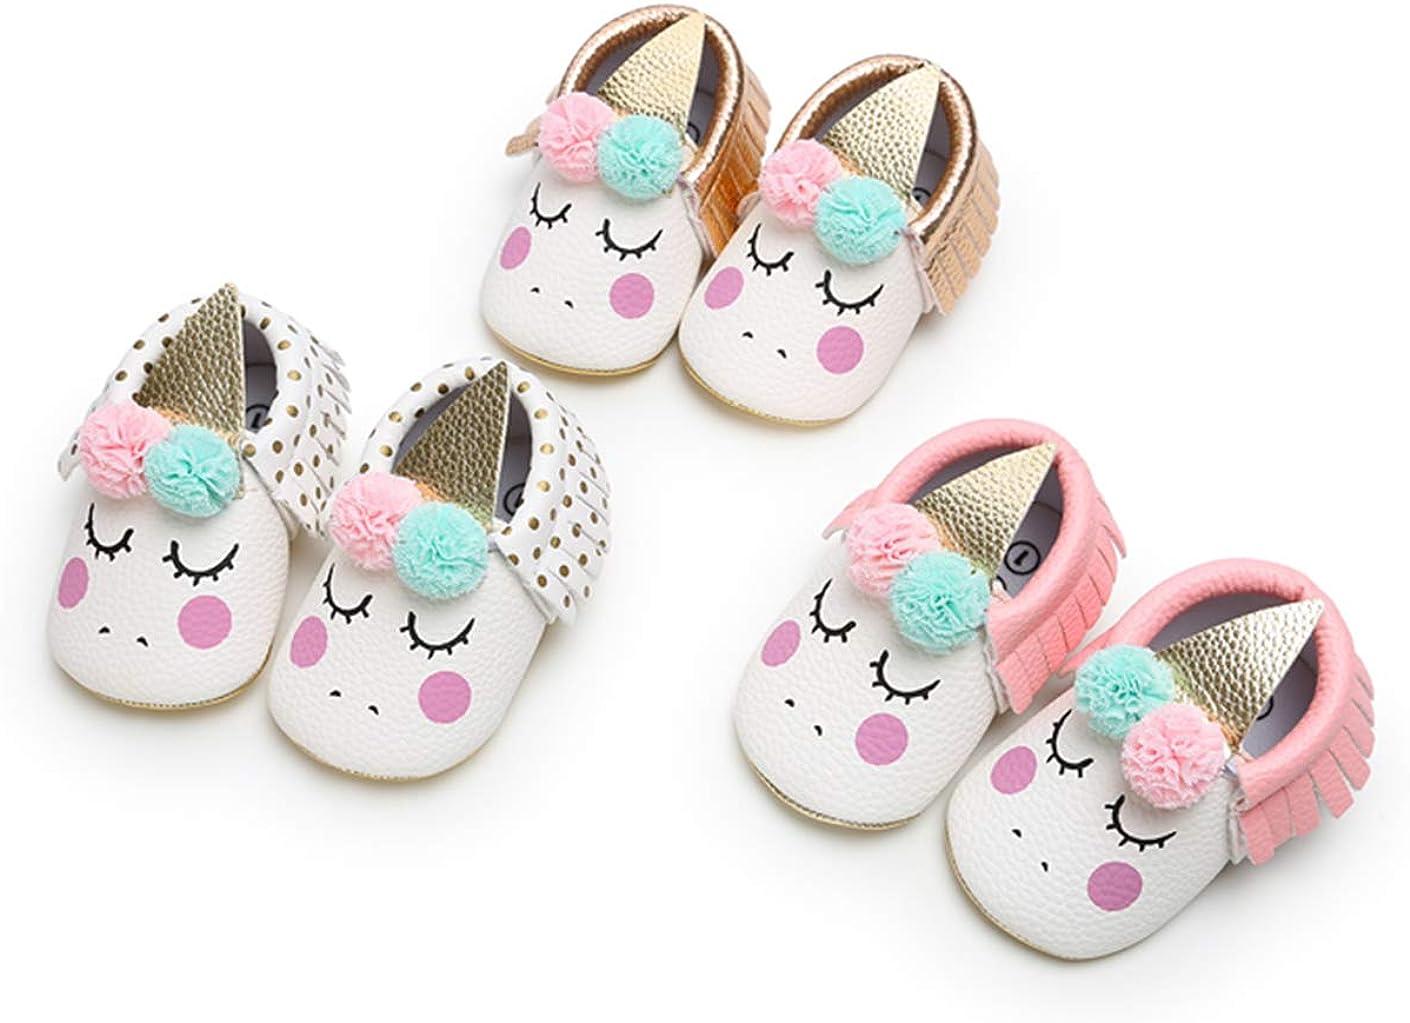 Bebila Unicorn Baby Moccasins Pu Leather Soft Sole Newborn Princess Babe Girls Shoes